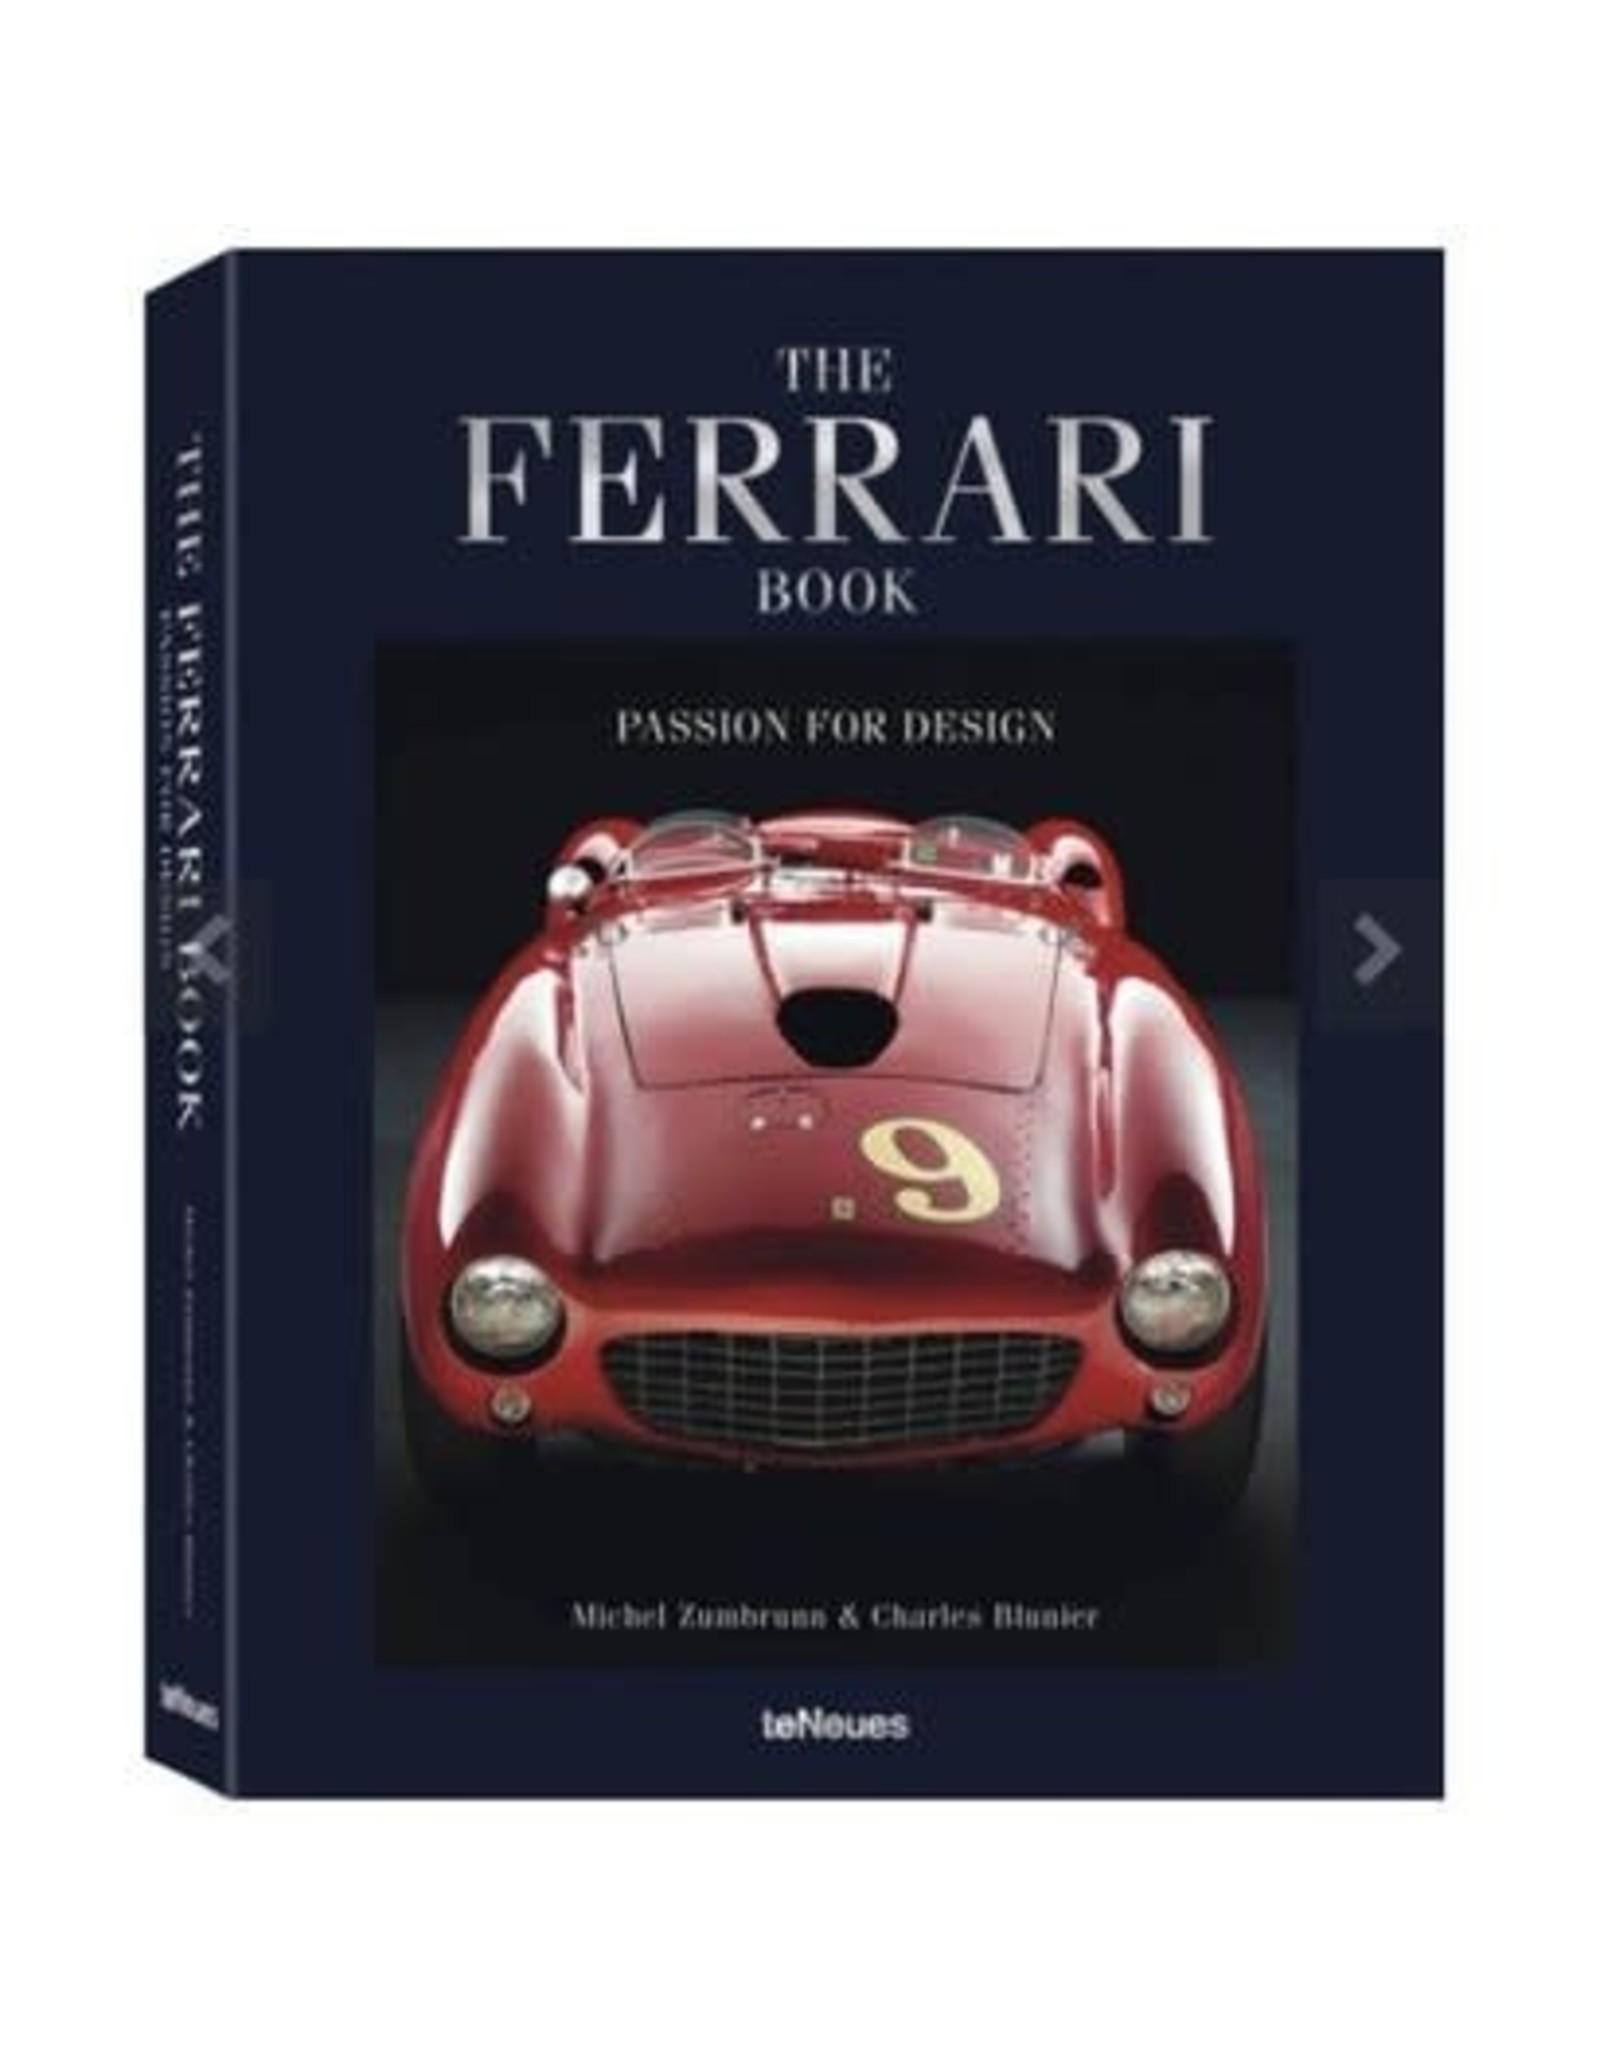 te Neues The Ferrari book